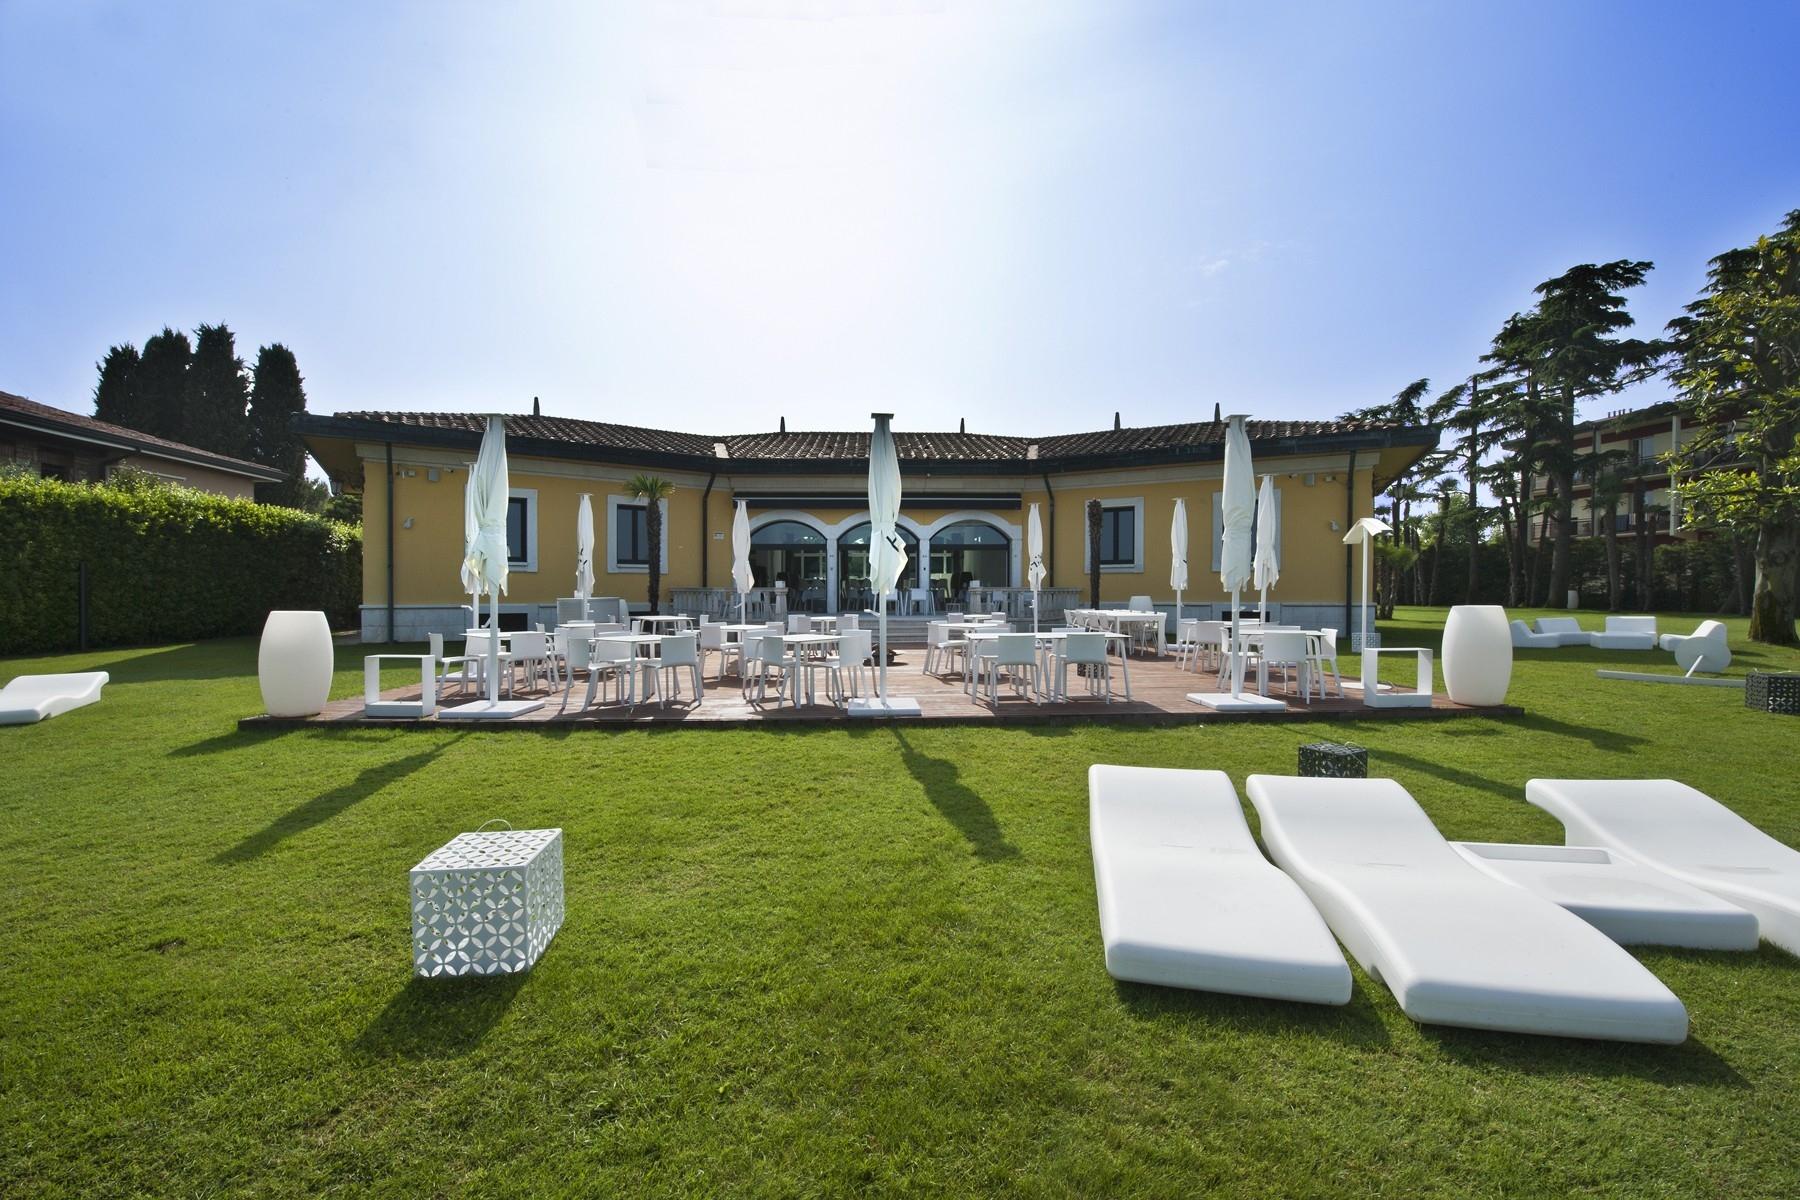 Villa in Vendita a Sirmione: 5 locali, 550 mq - Foto 4